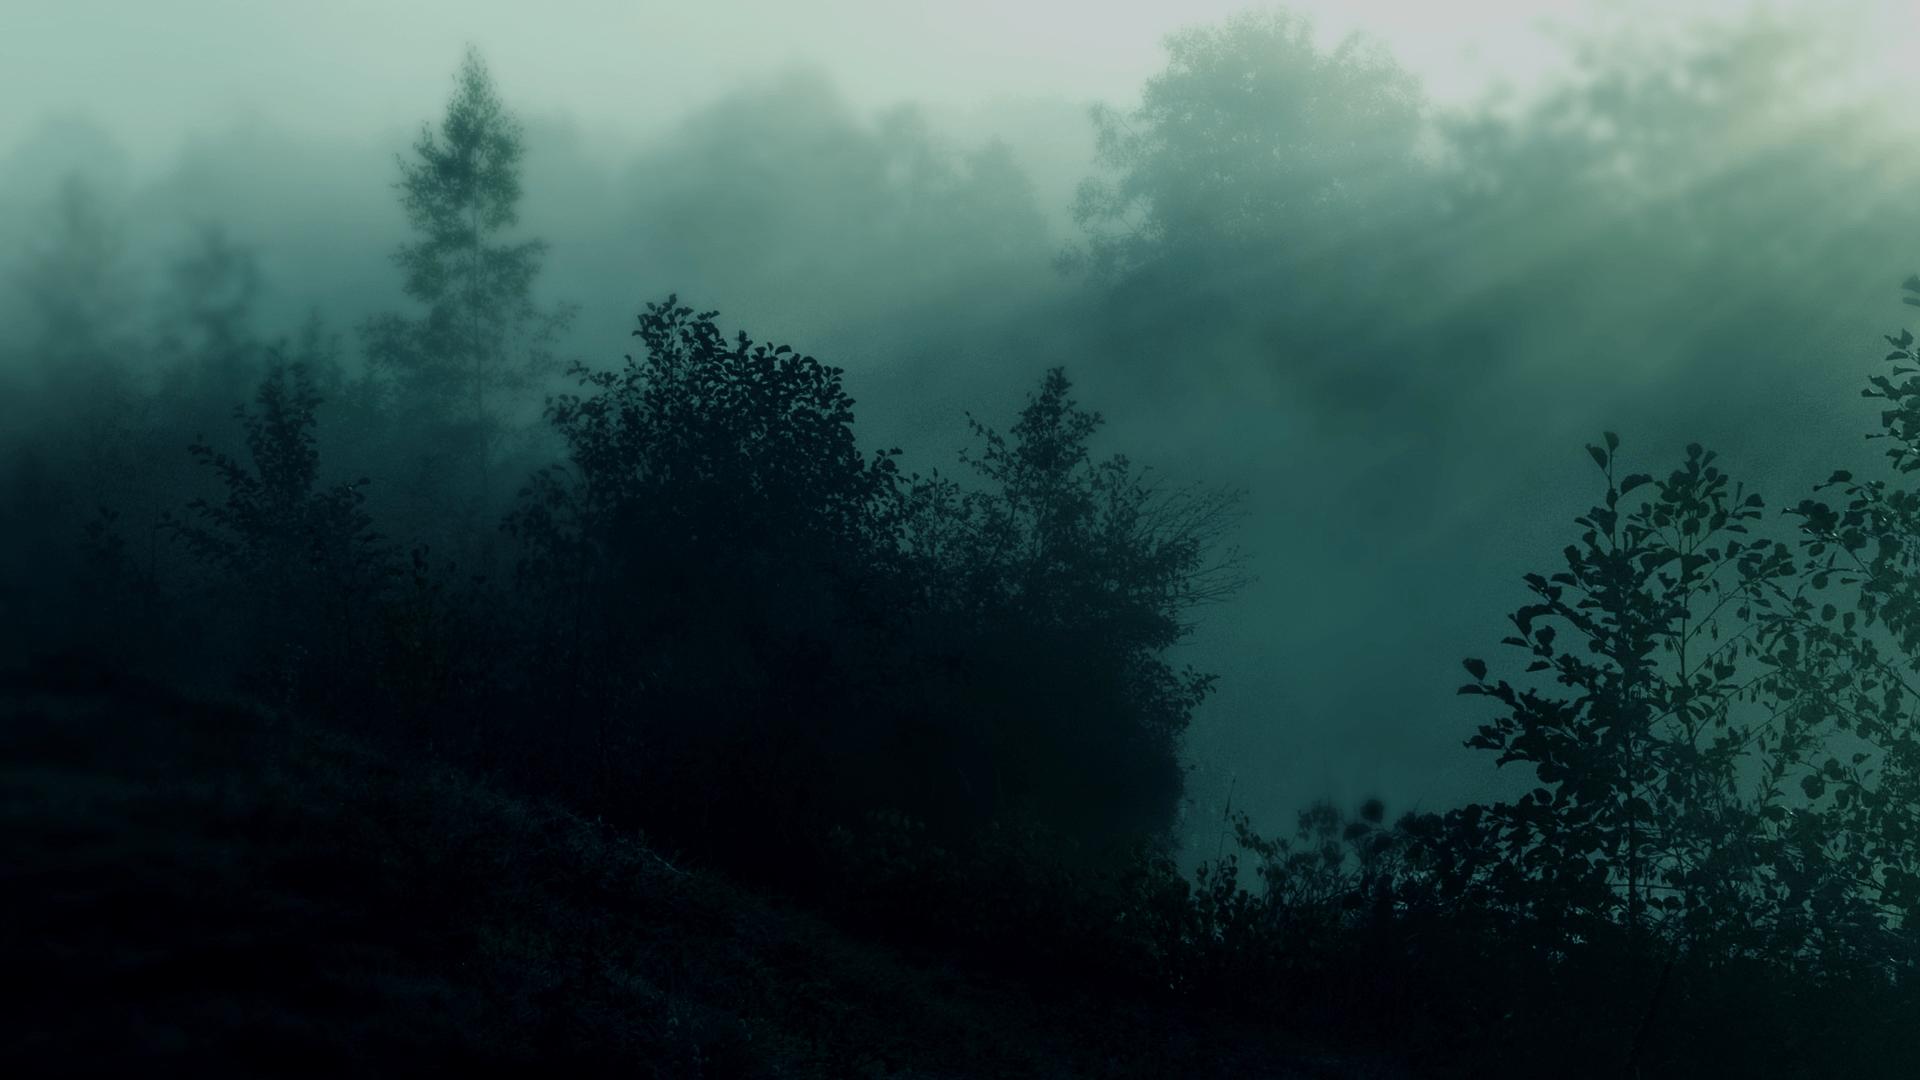 Aesthetic Lockscreen Tumblr Stunning Wallpapers Landscape Wallpaper Forest Landscape